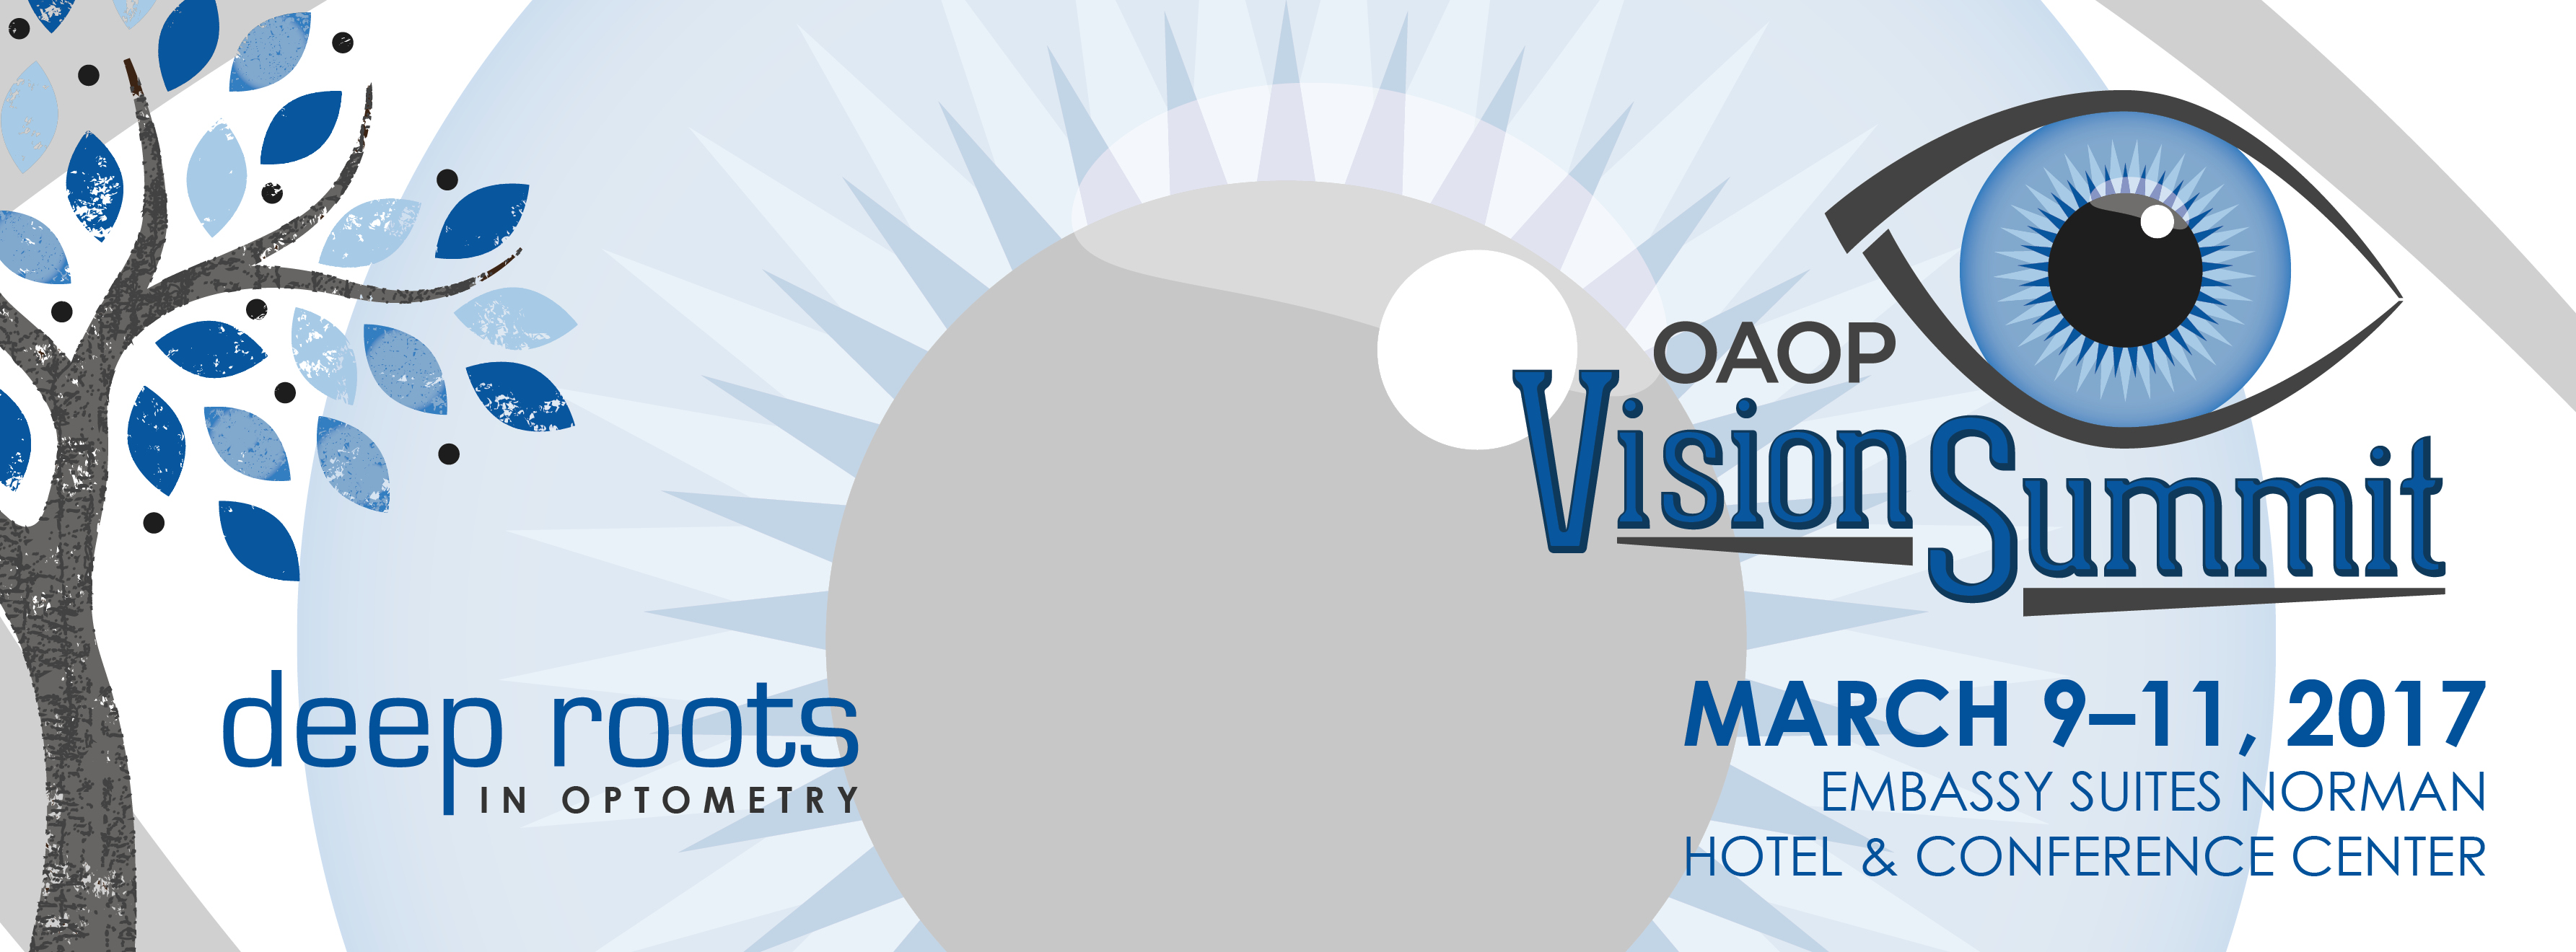 2017 OAOP Vision Summit